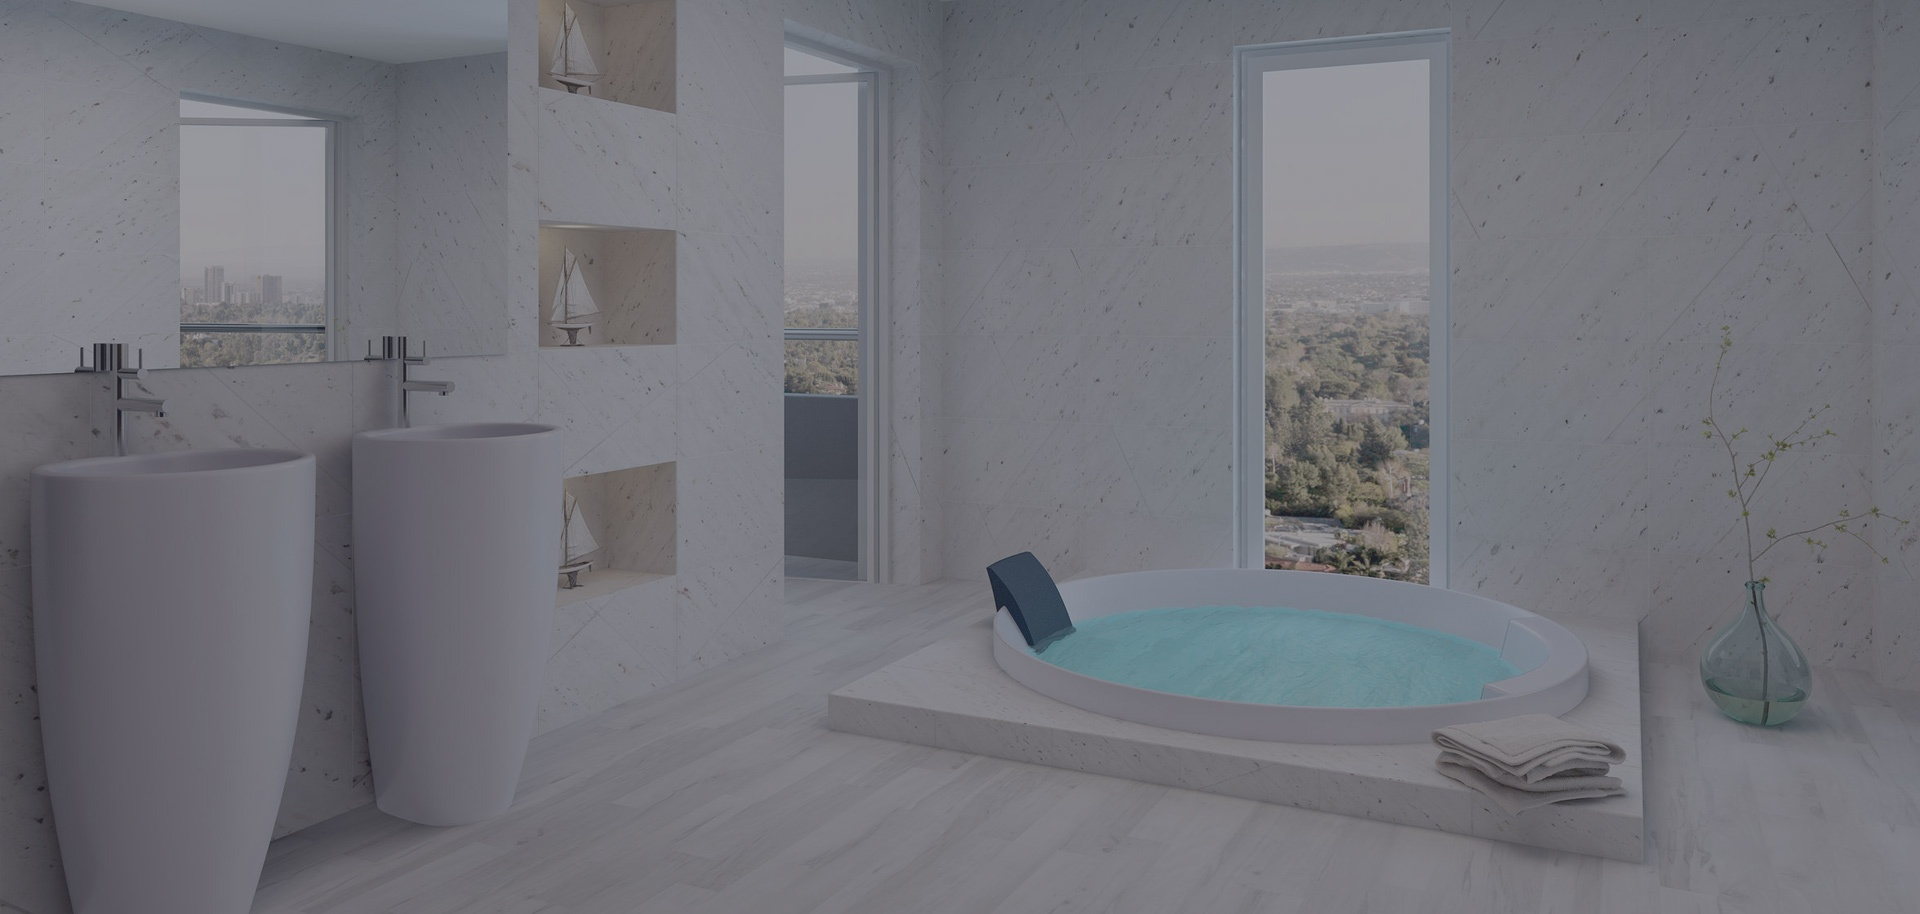 Inmobiliaria en manresa pisos en manresa asesoria integral consultin - Alquiler pisos en terrassa particulares ...